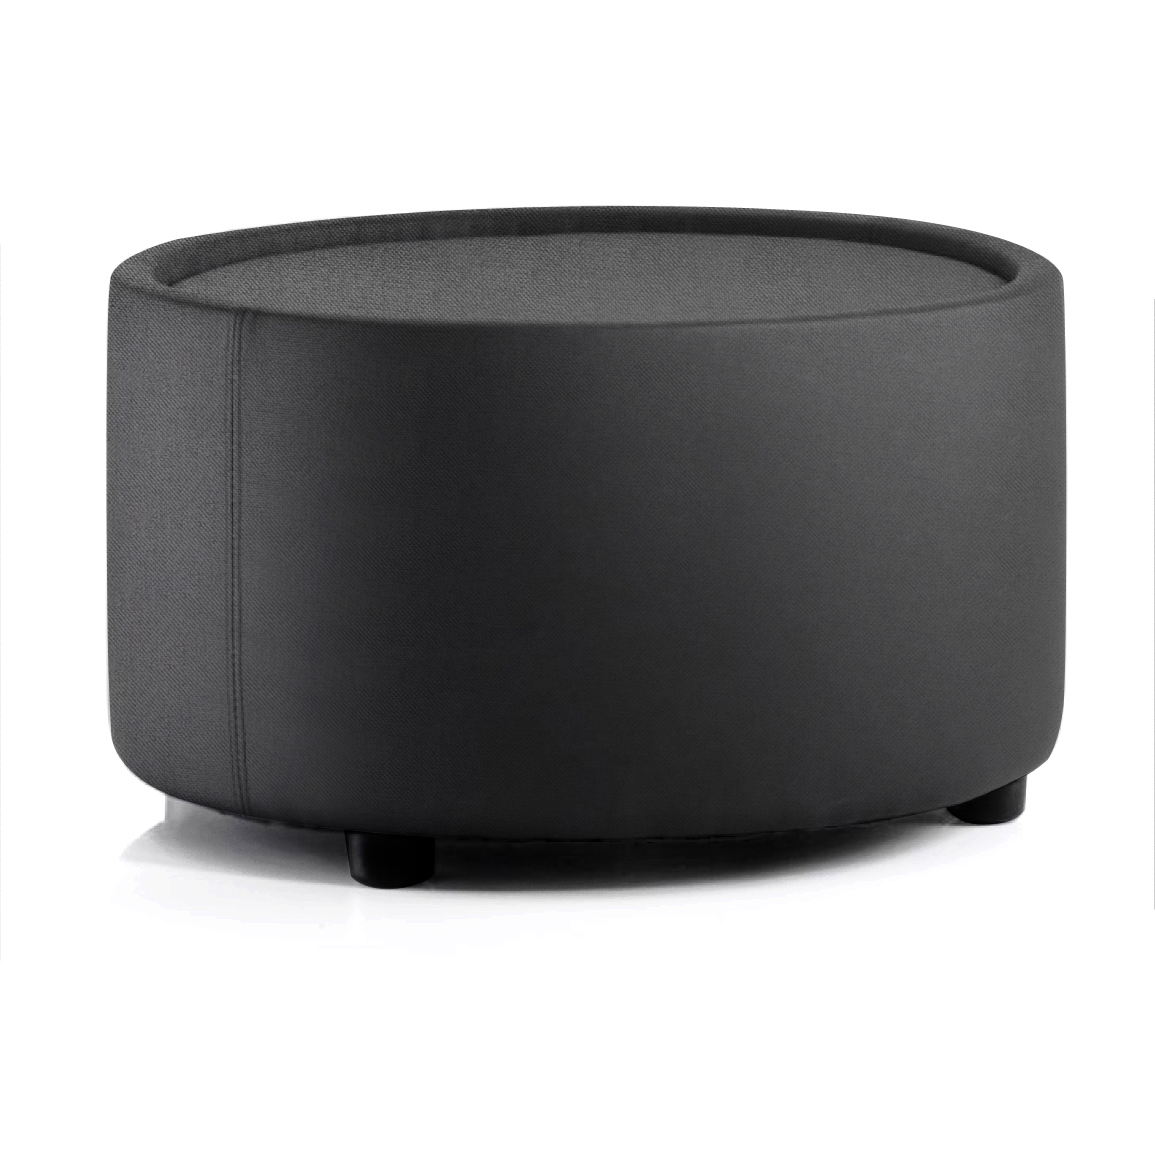 #TREXUS TUB TABLE BLACK